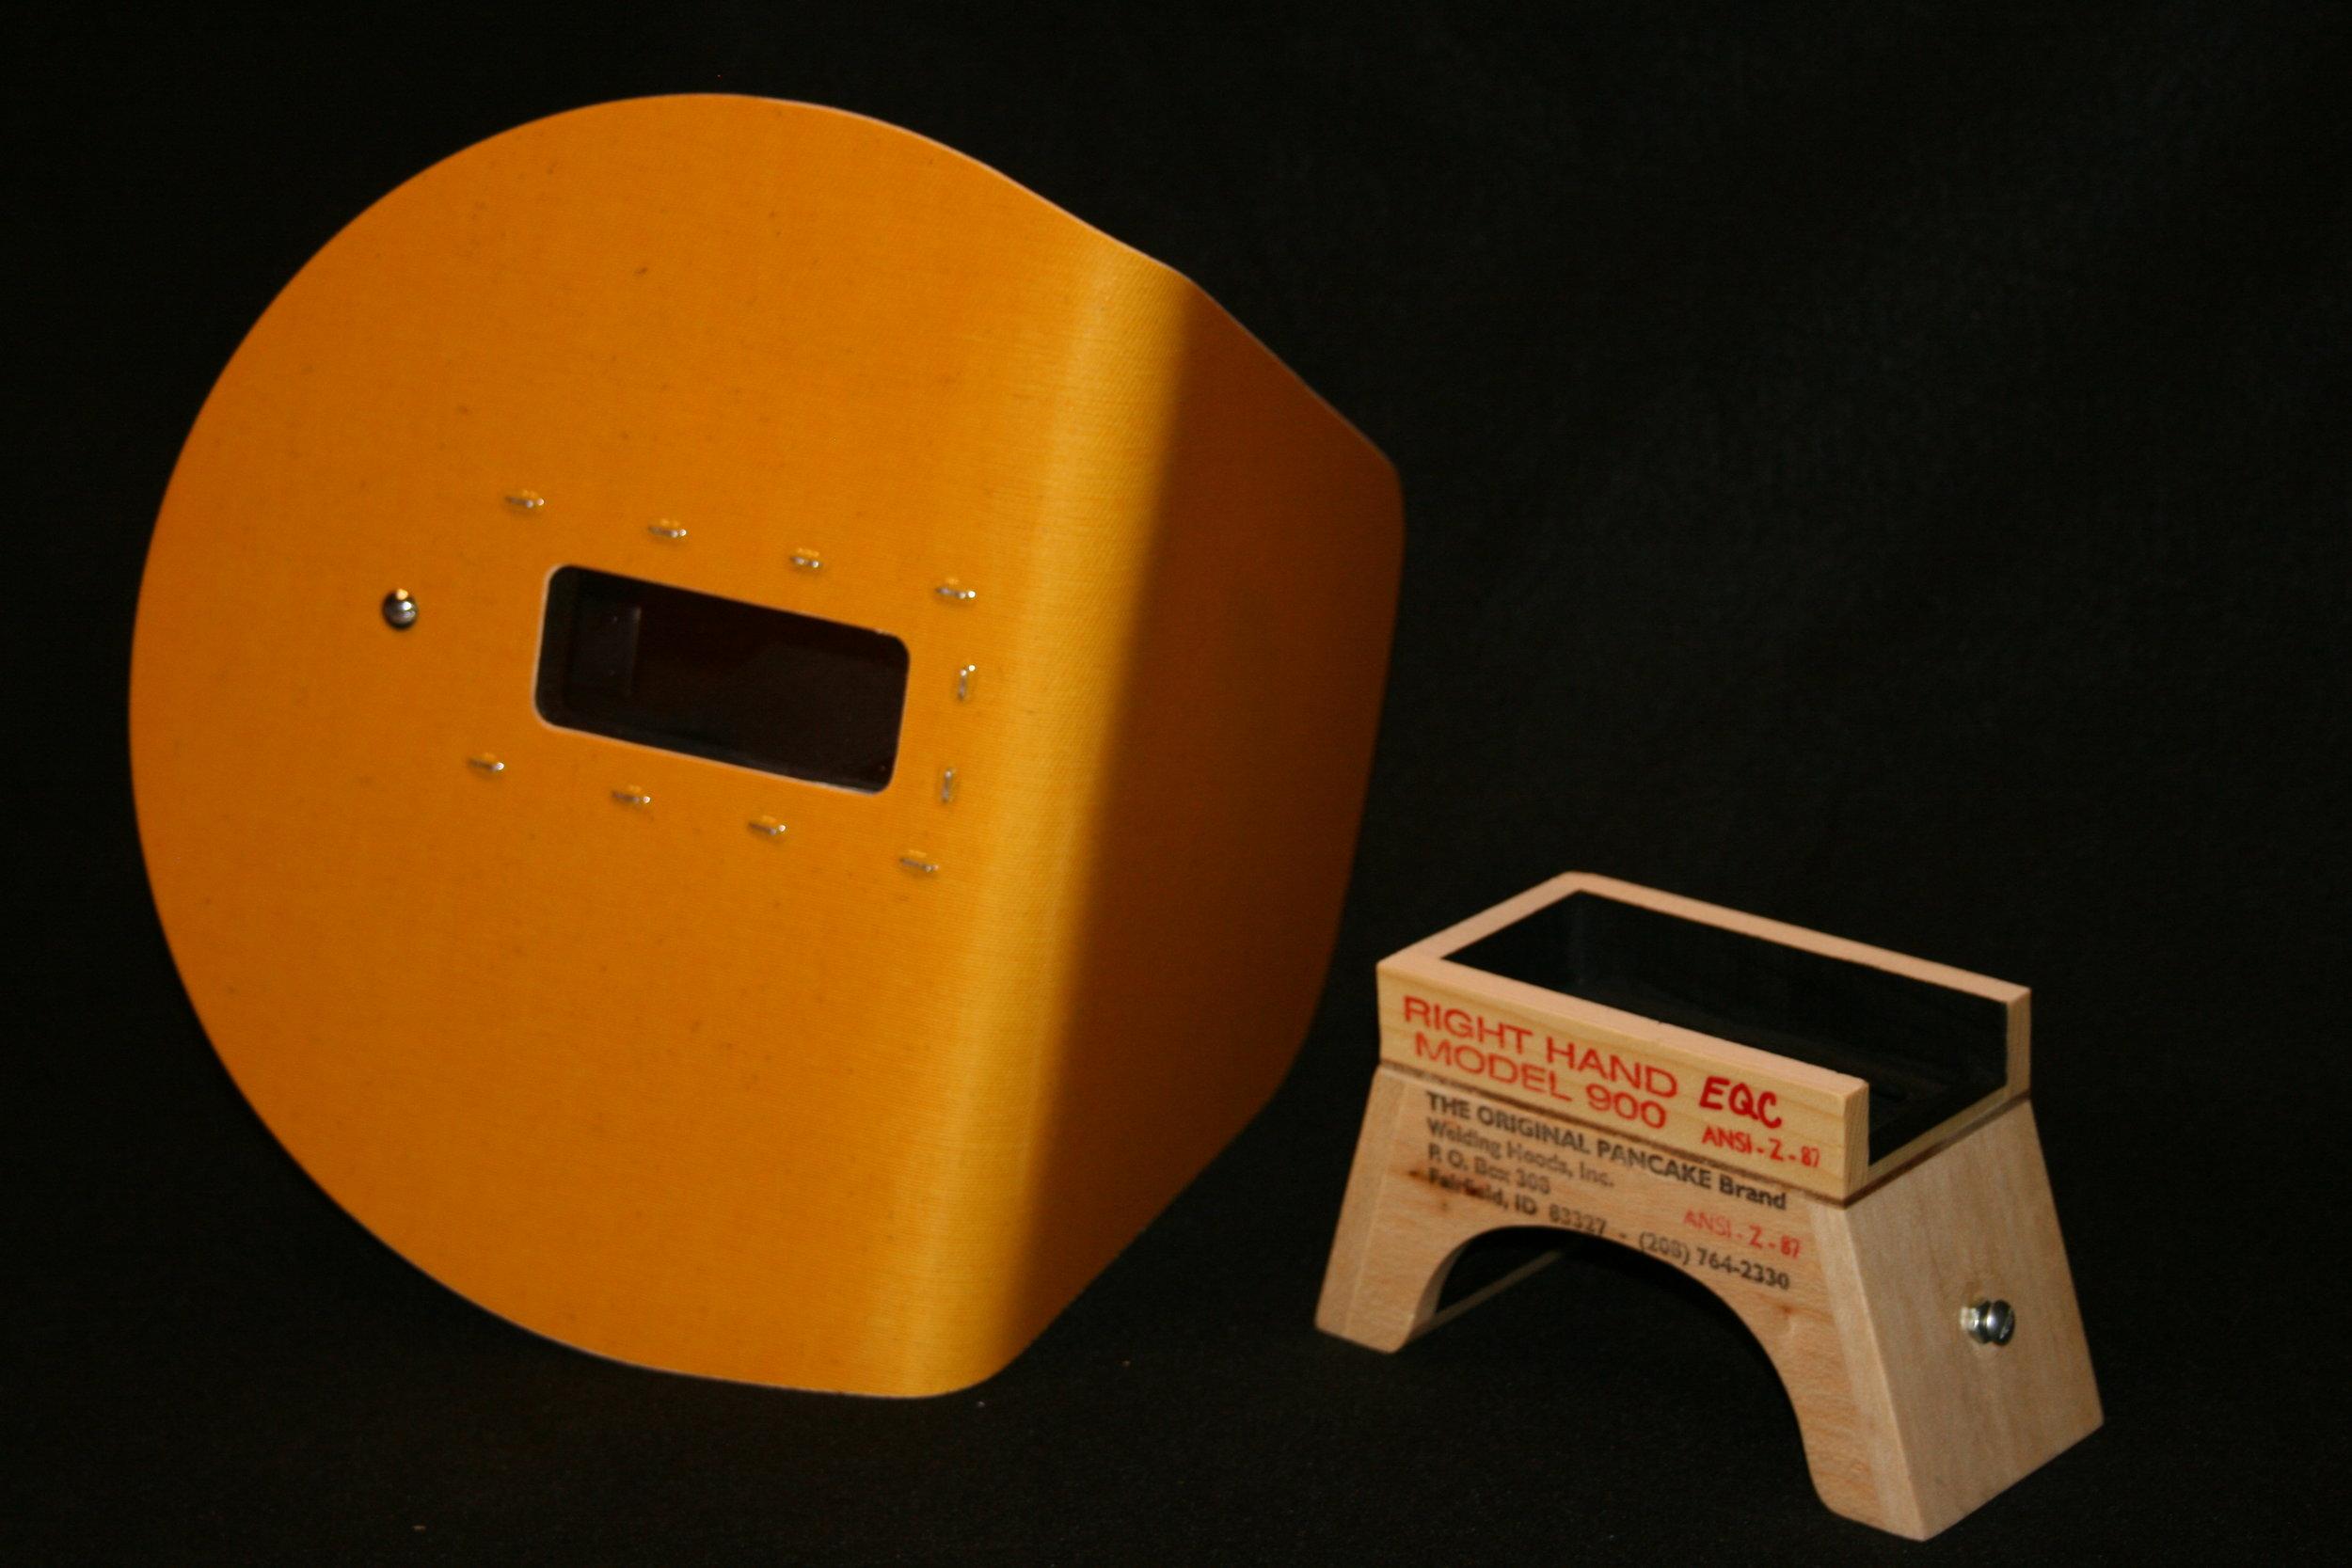 The Original Pancake Welding Hood w// Strap Right Handed